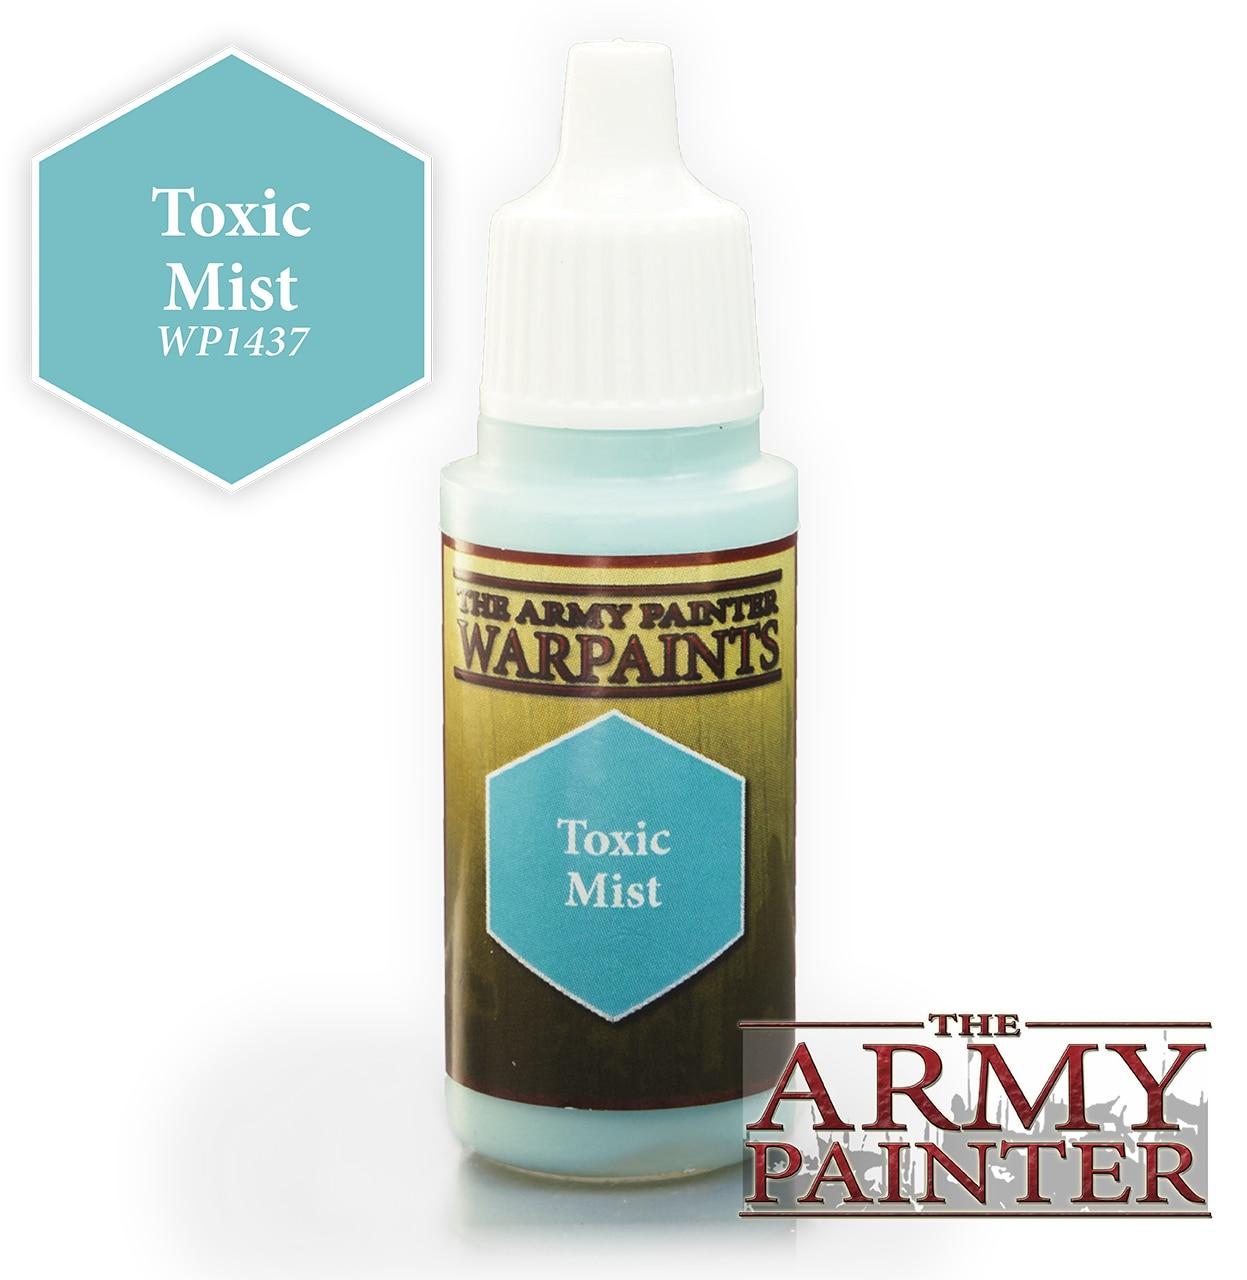 Army Painter Warpaint - Toxic Mist